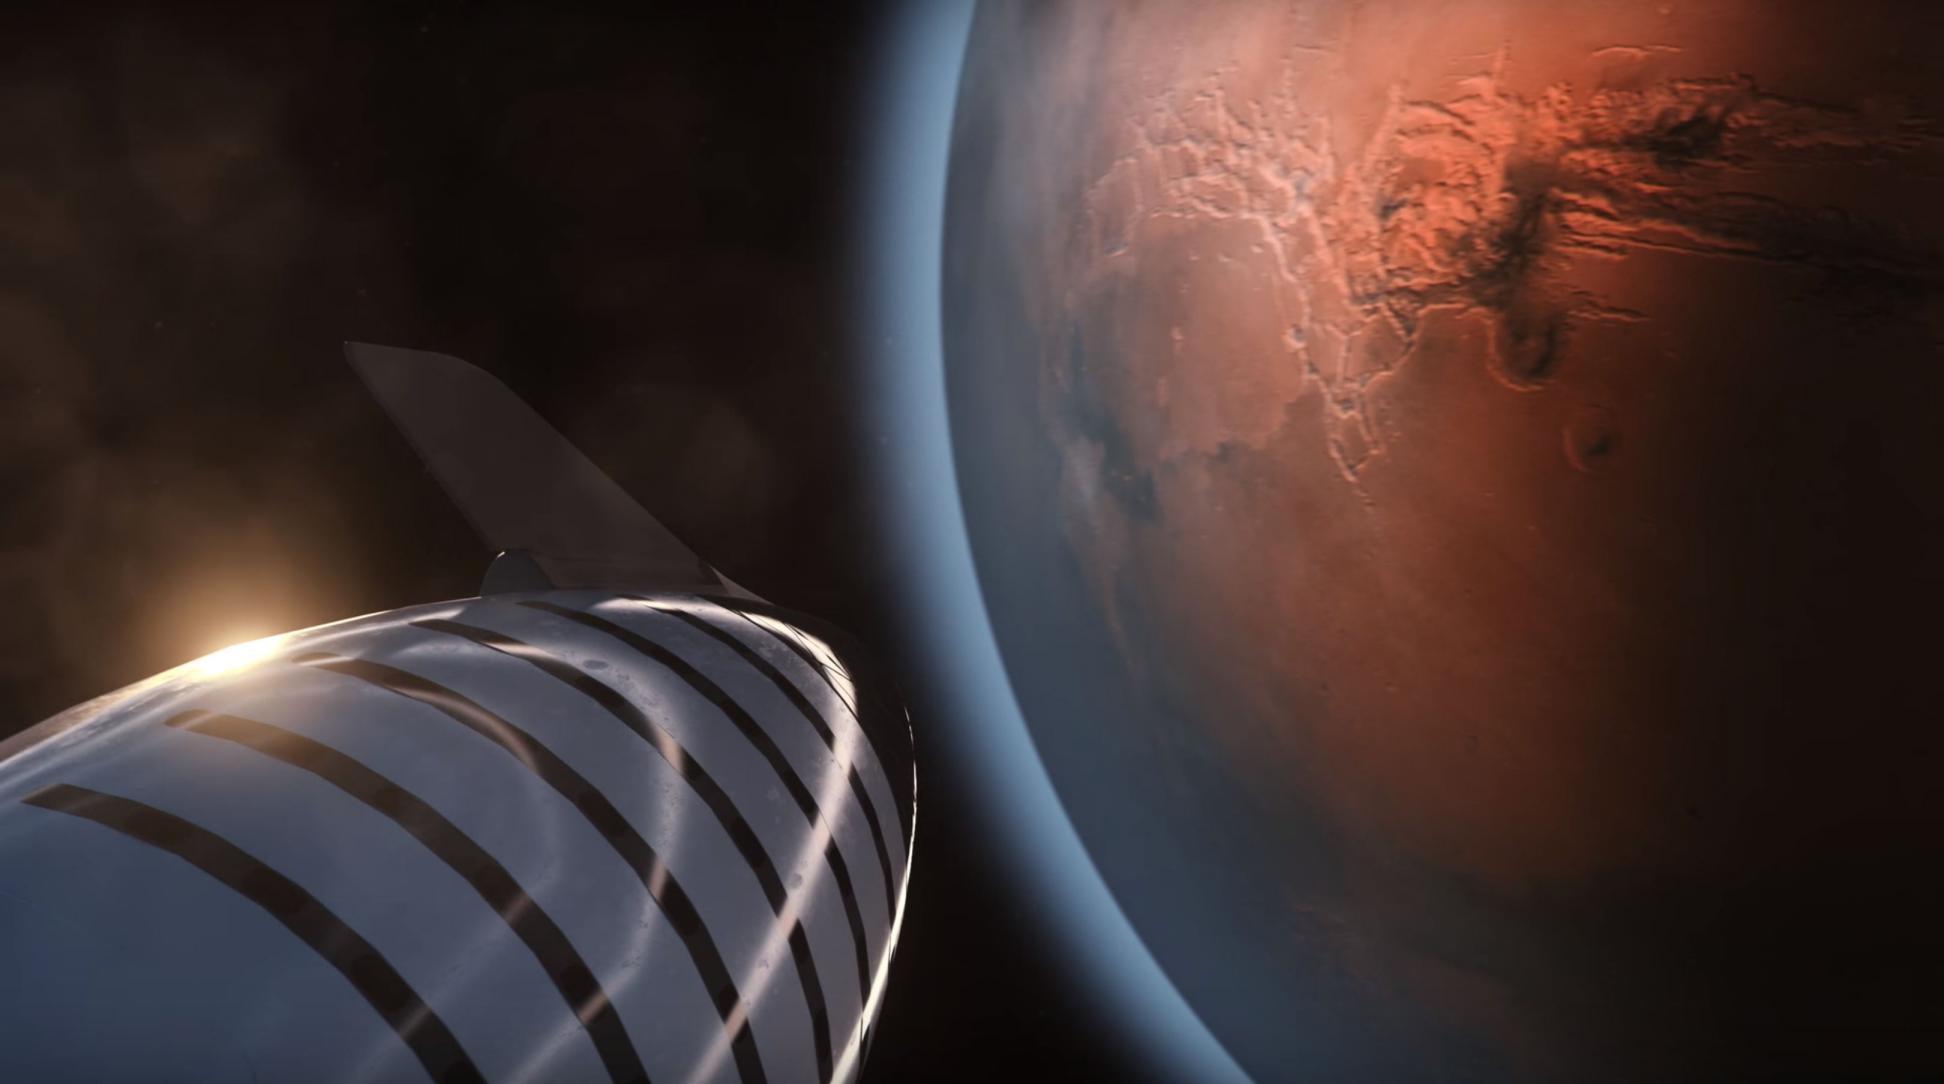 BFR 2018 spaceship Mars (SpaceX) 2(c)